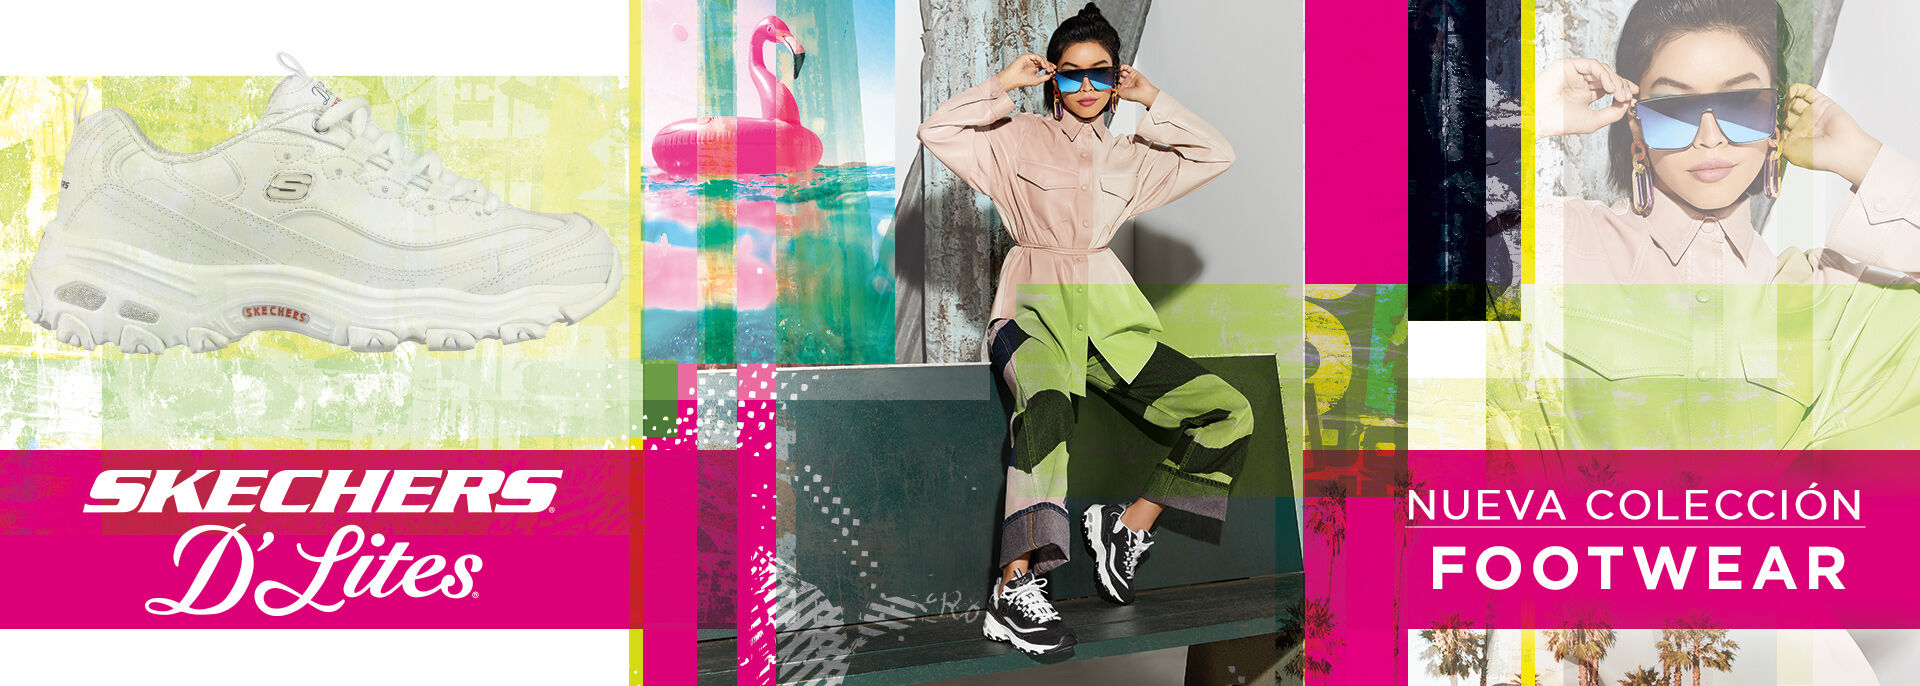 footwear_calzado_nuevatemporada_skechers_1920x686.jpg